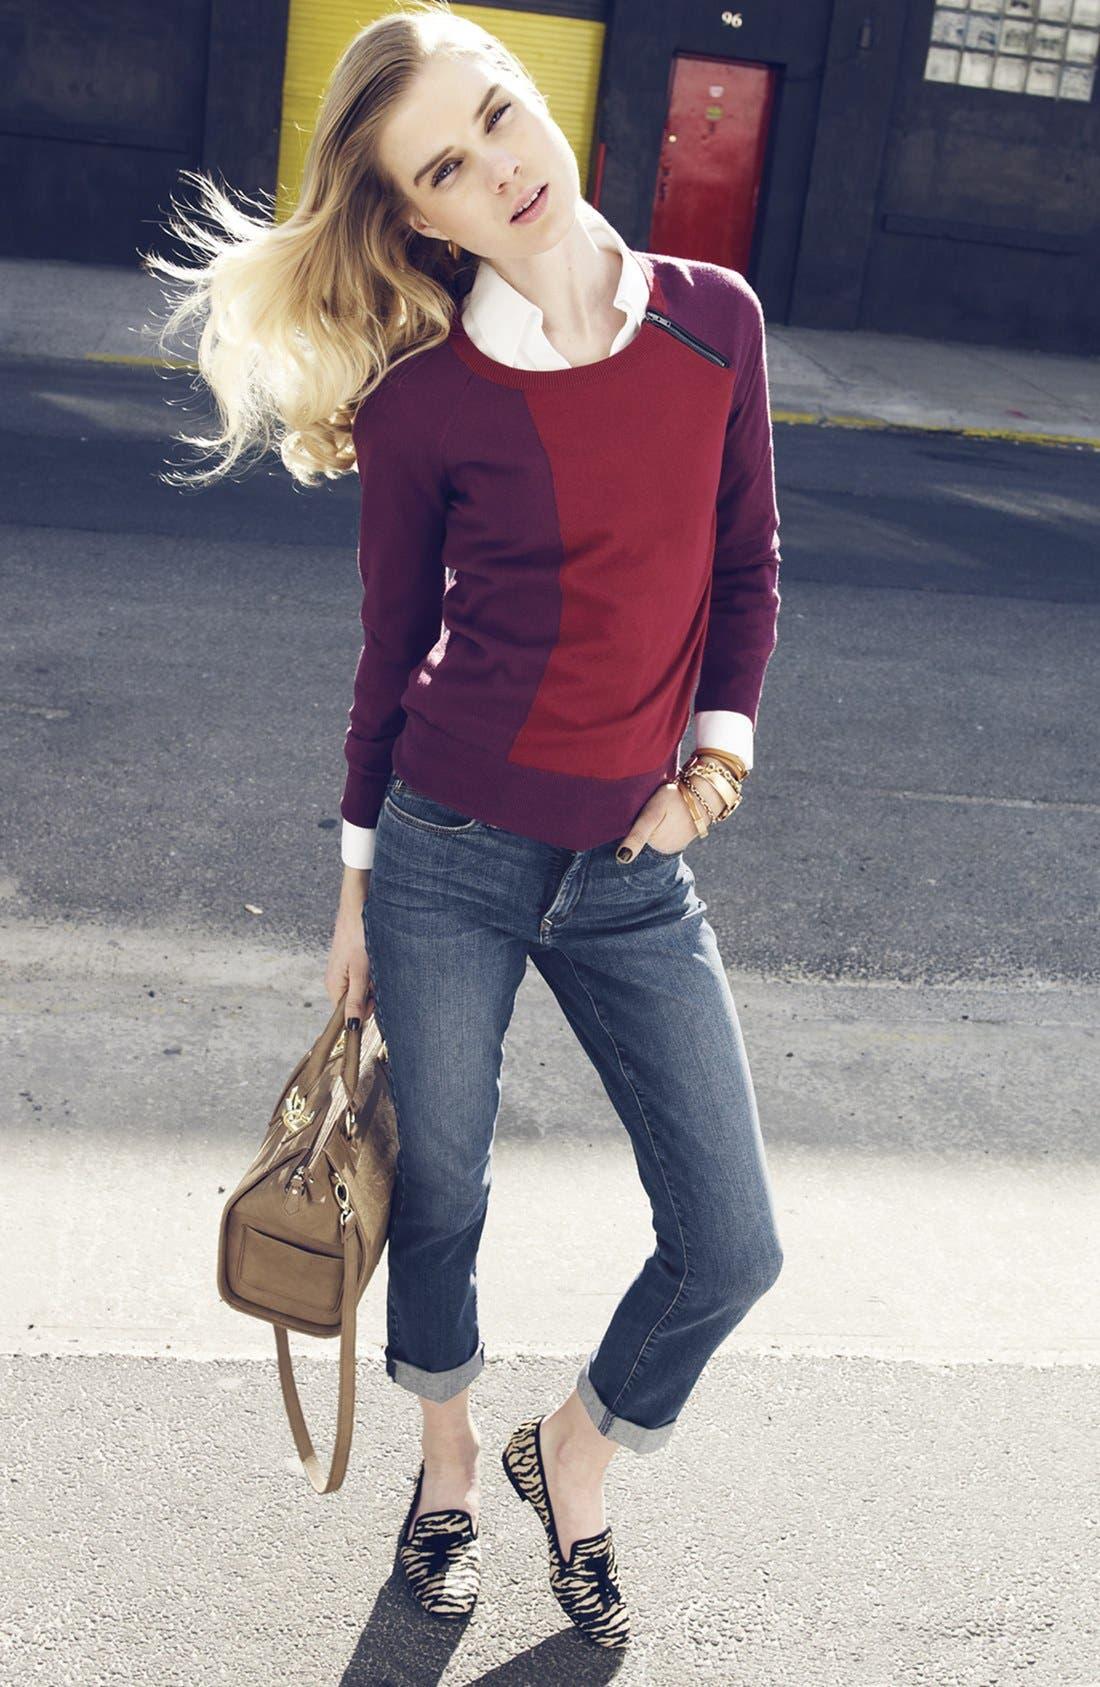 Main Image - Amber Sun Sweater, Foxcroft Shirt & NYDJ 'Leann' Skinny Boyfriend Jeans